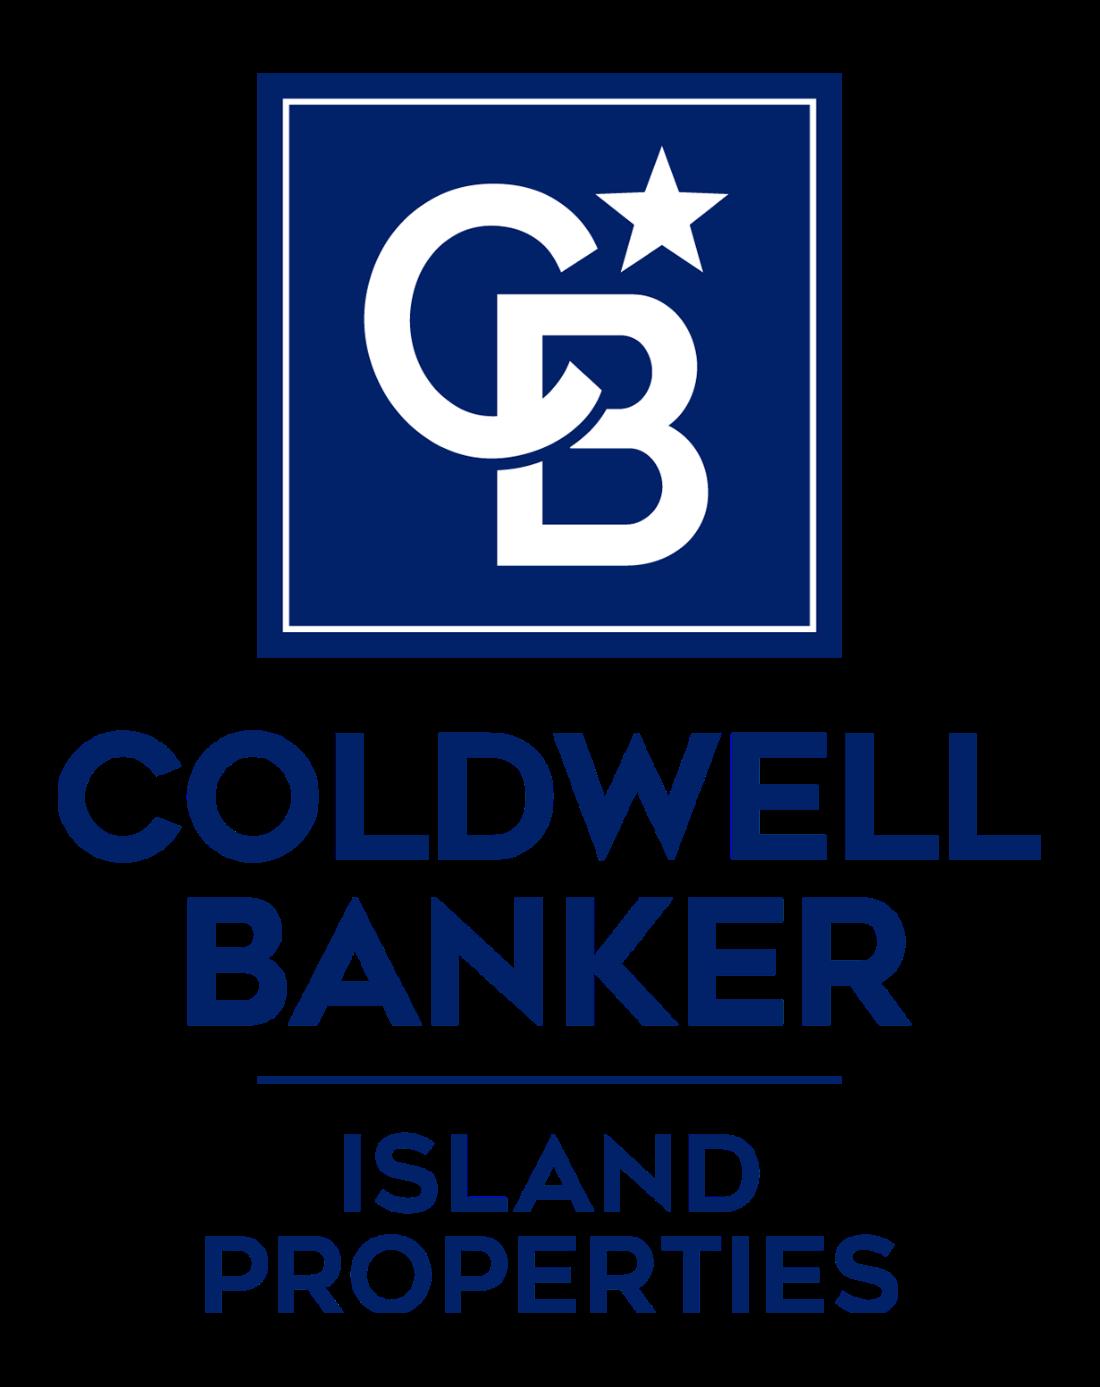 Naomi Campbell - Coldwell Banker Island Properties Logo